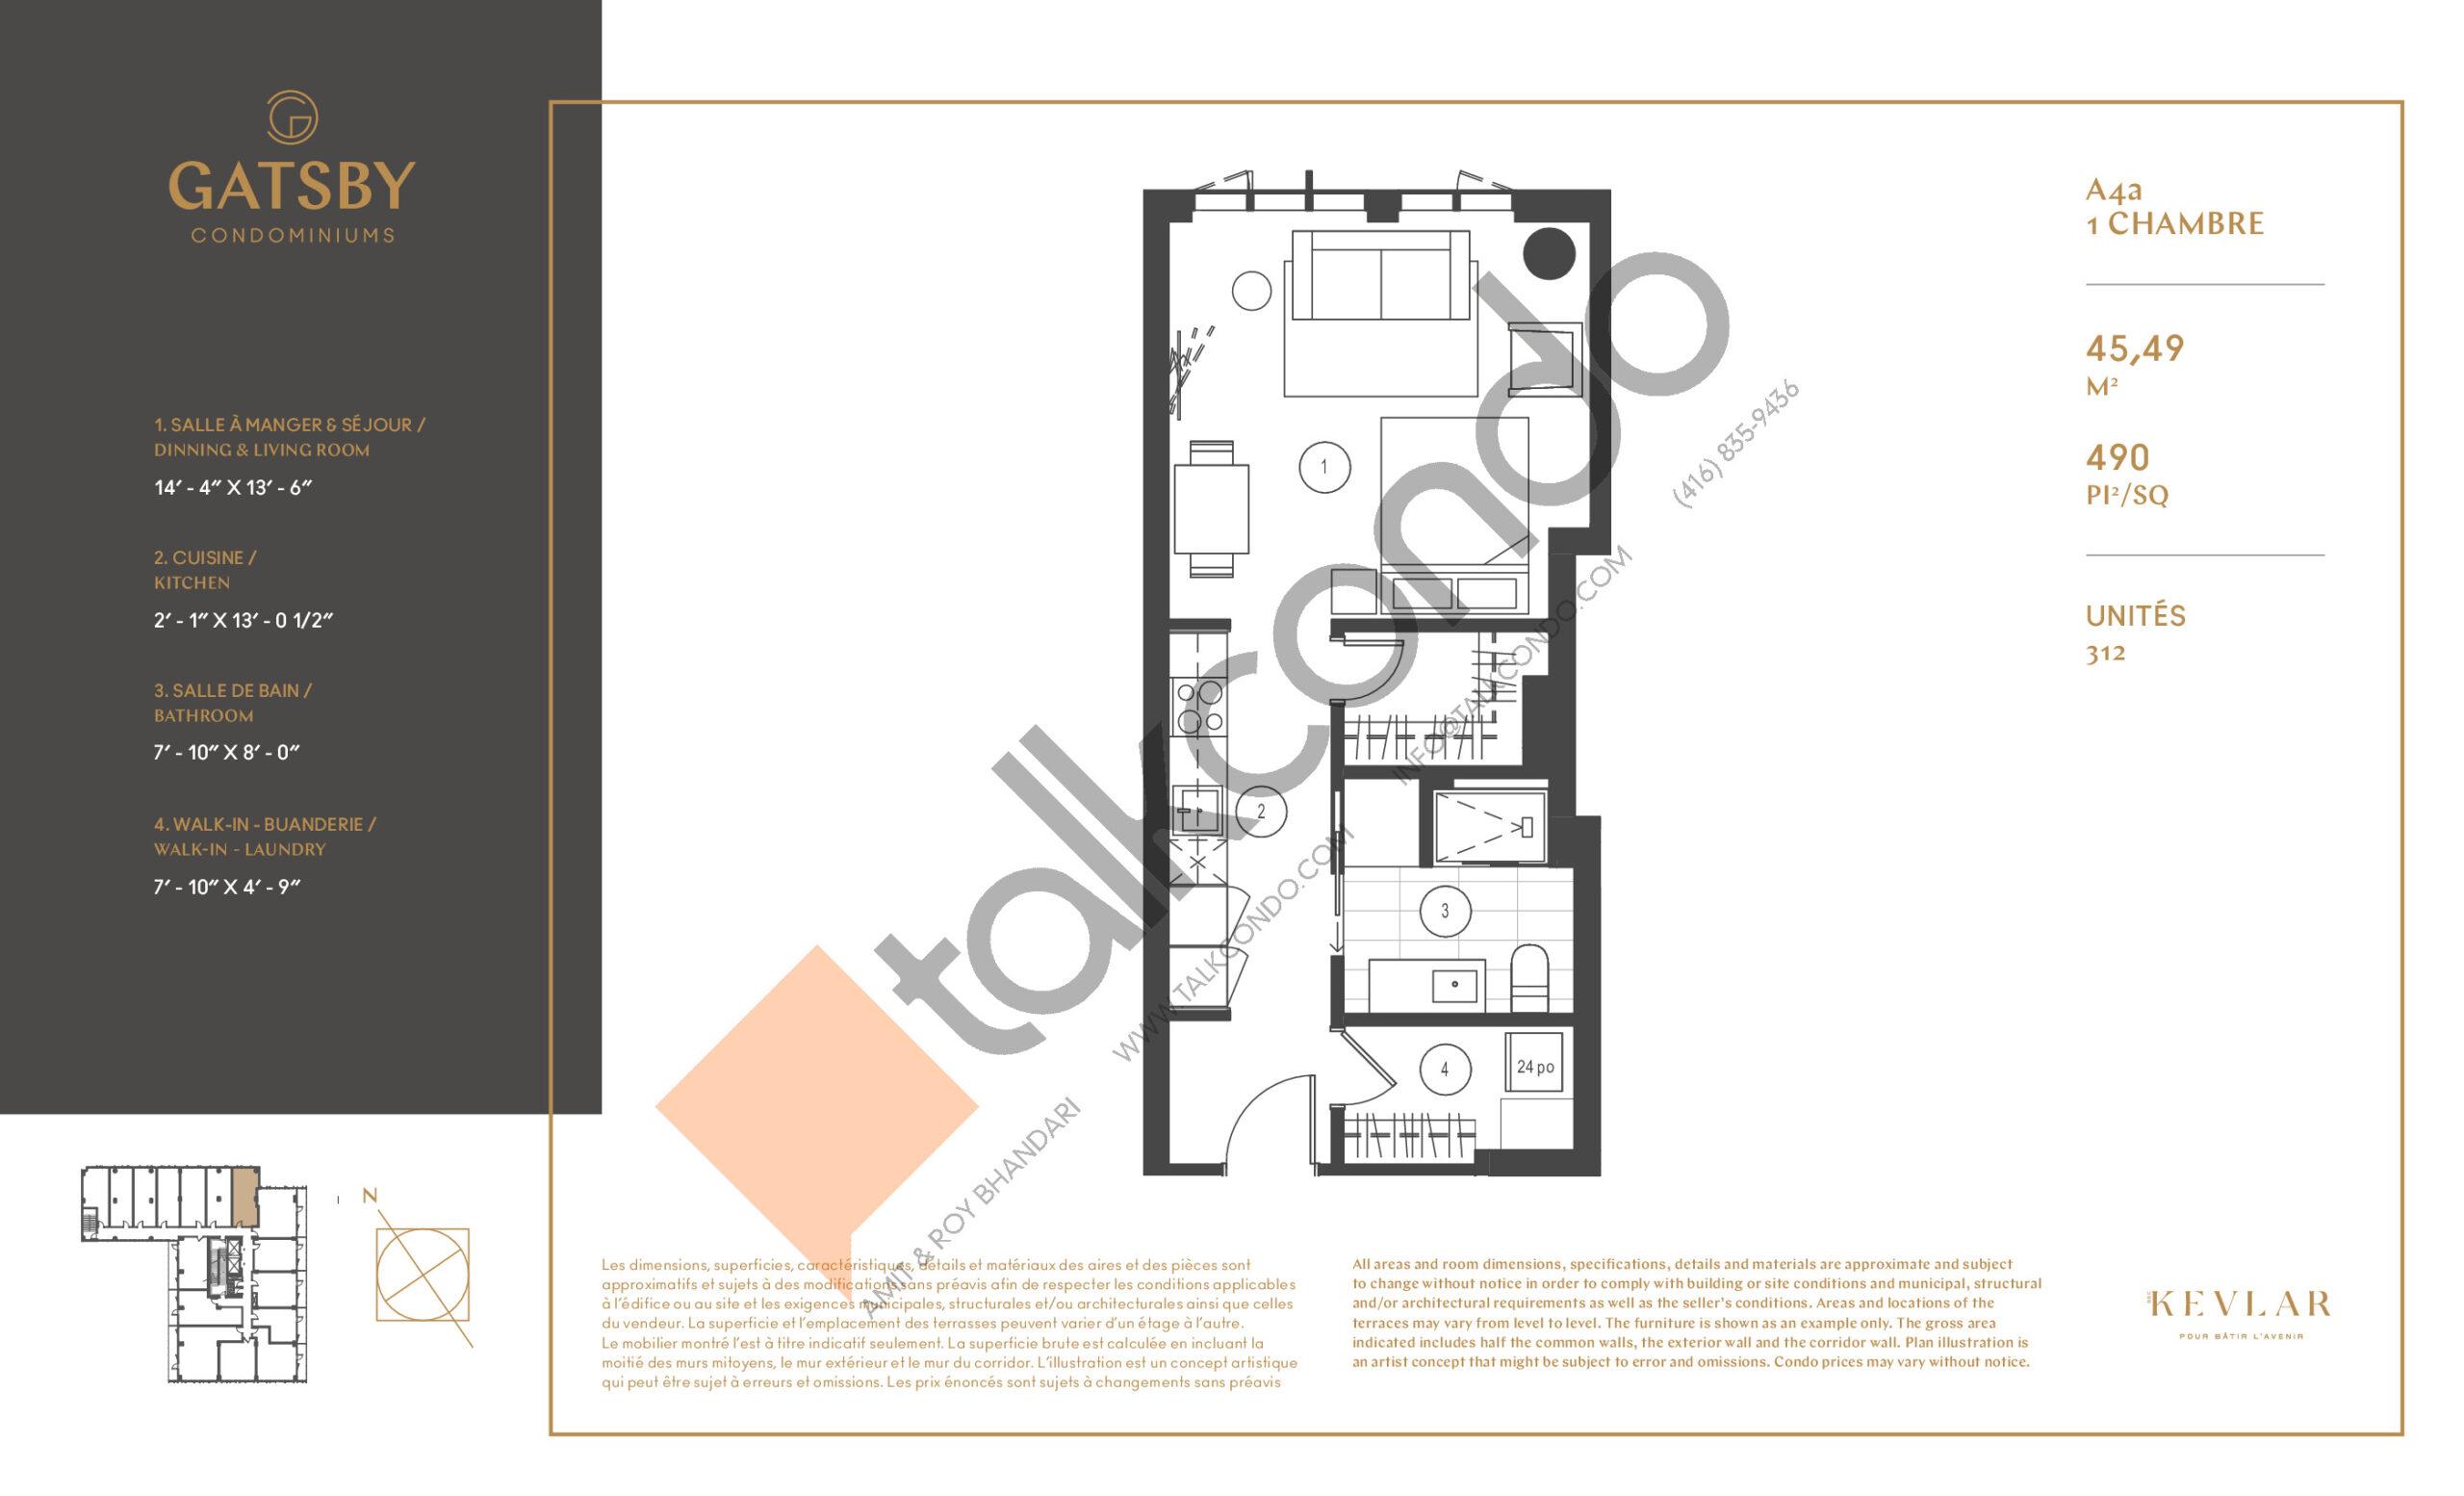 A4a Floor Plan at Gatsby Condos - 490 sq.ft